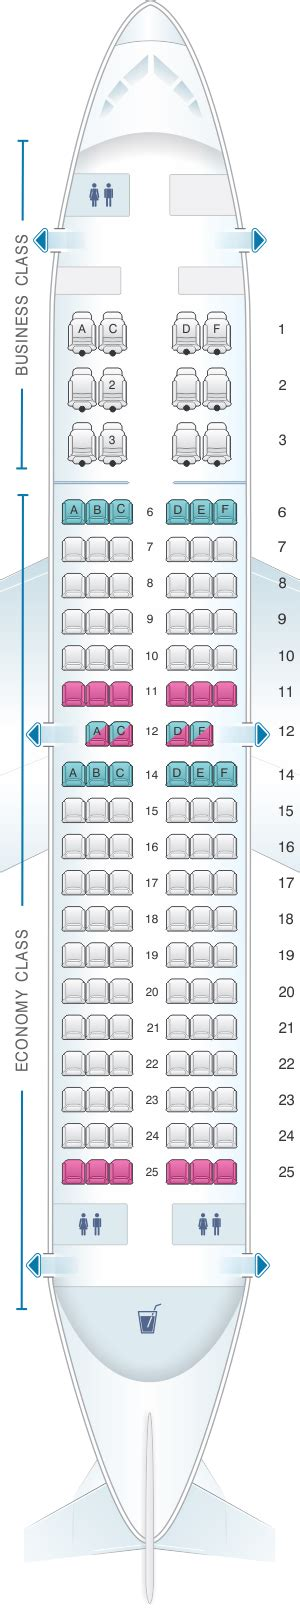 boeing 737 plan sieges plan de cabine aeromexico boeing b737 700 seatmaestro fr